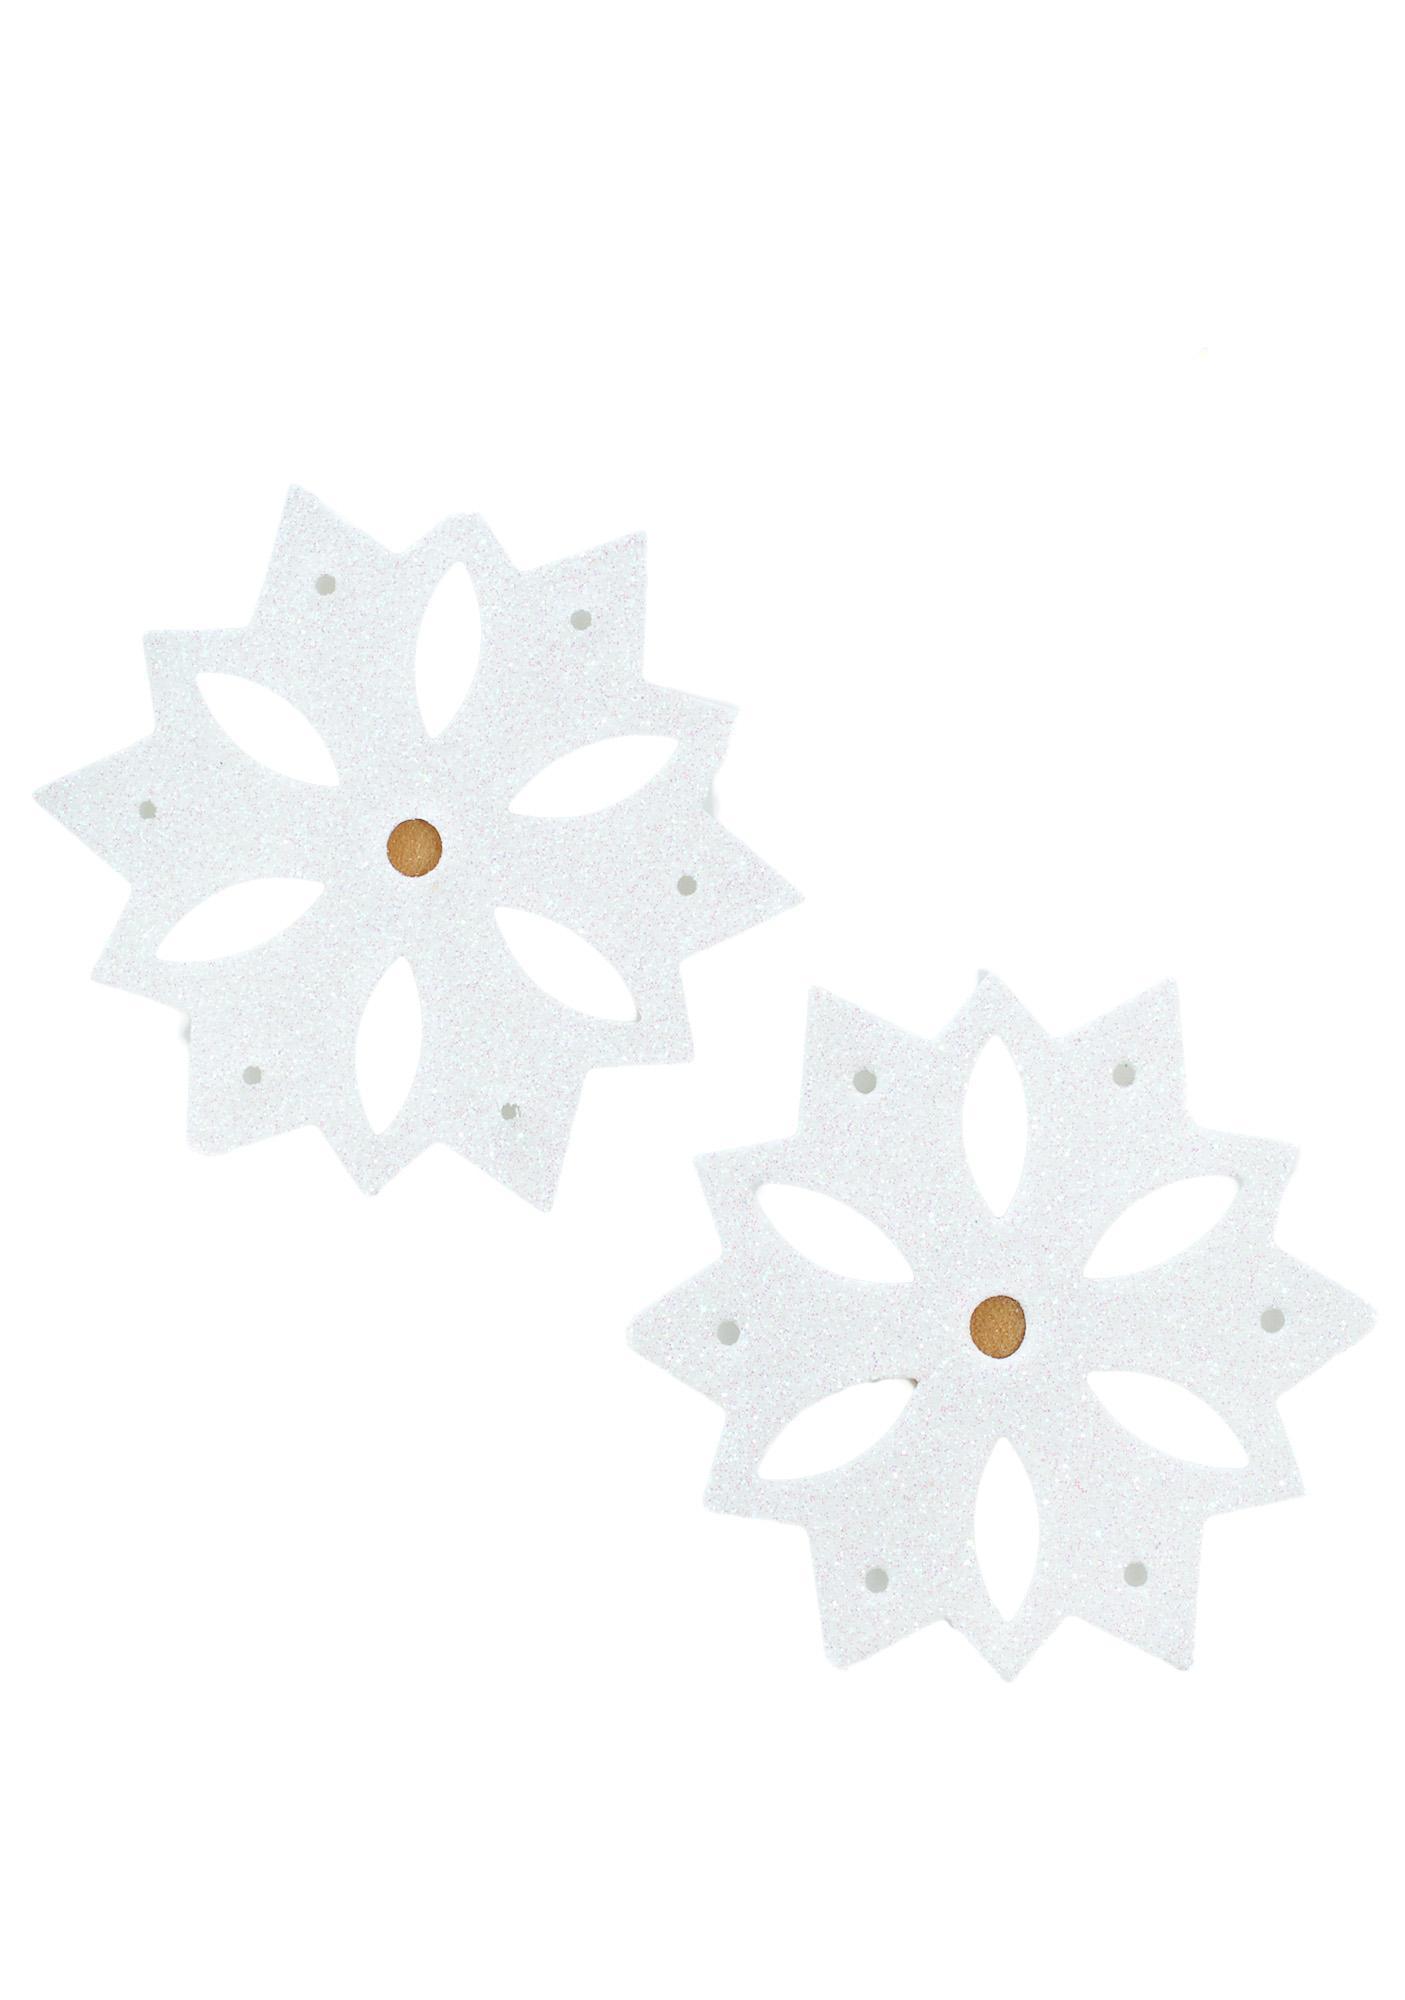 Pastease Snowflake Pasties